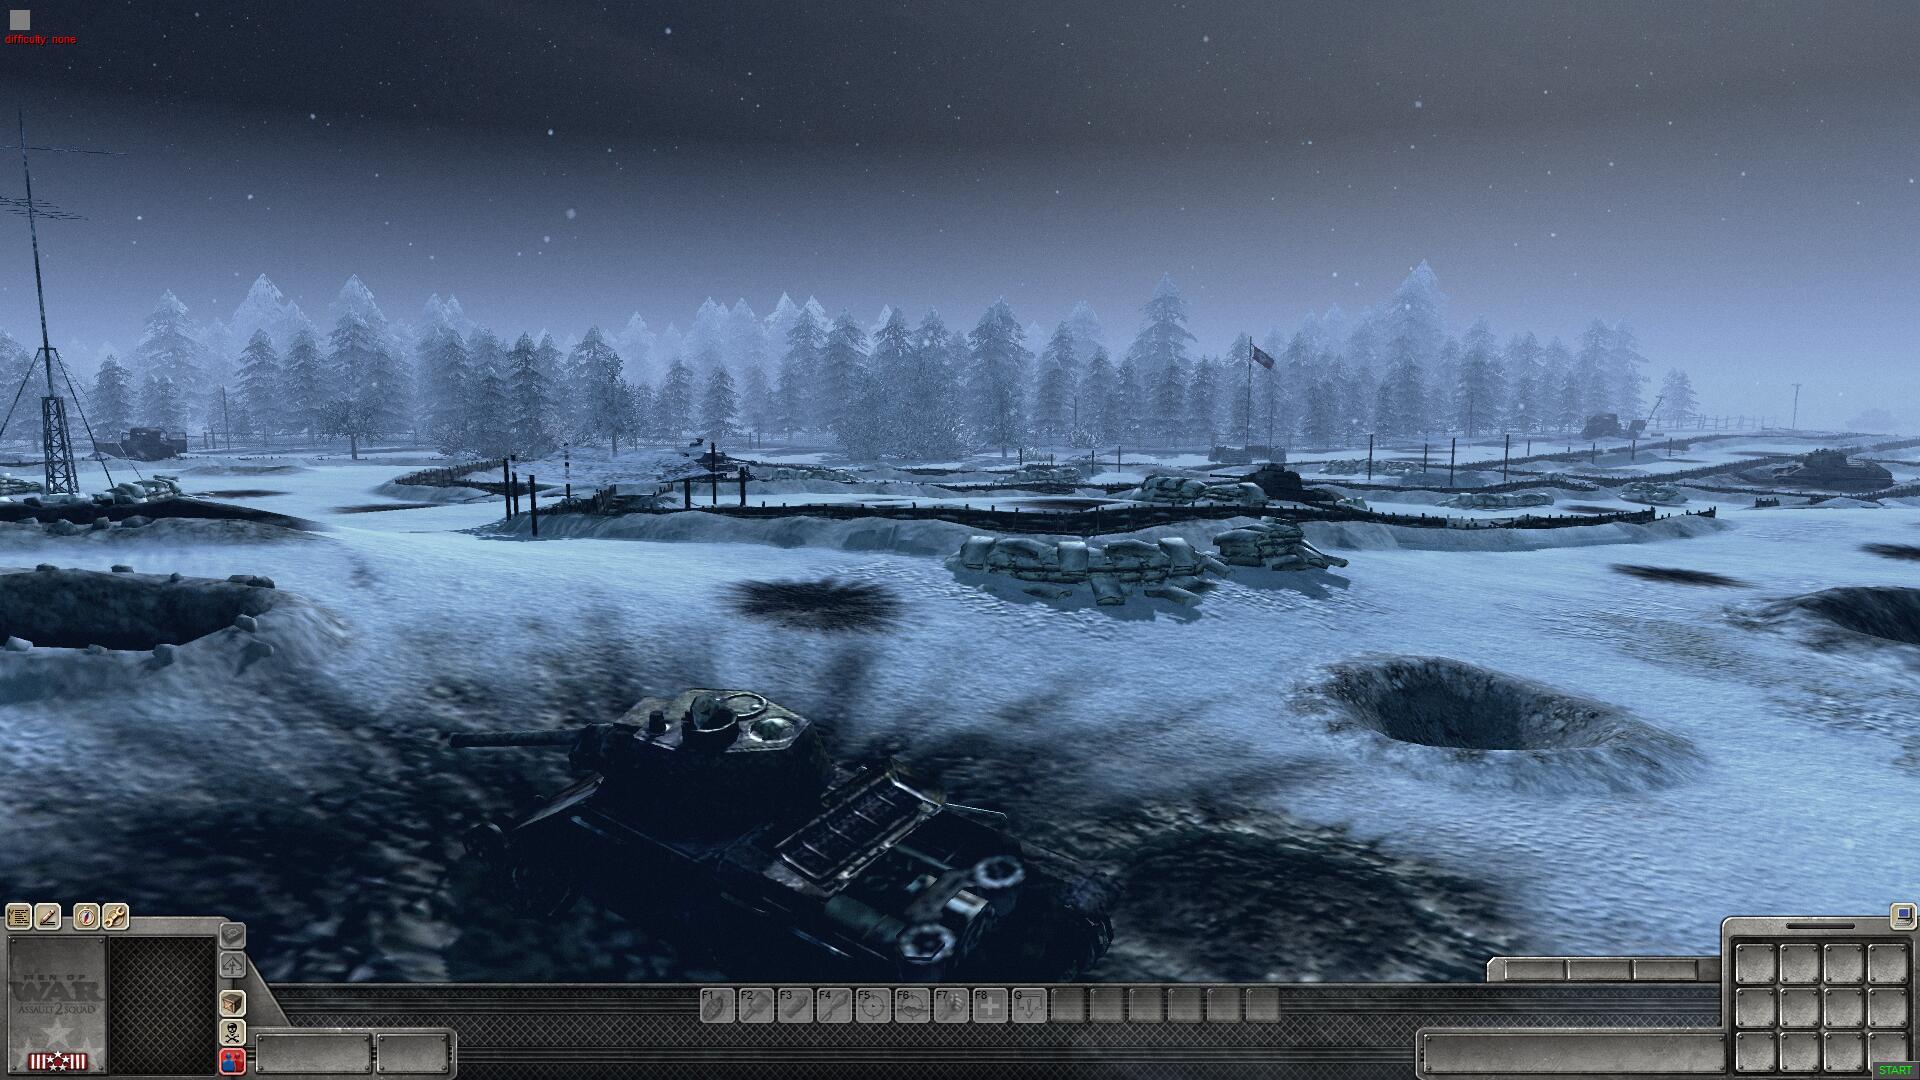 Скачать 3D модель Reich Sky - Frozen Forest v1.5 — (AS2 — 3.260.0) (v16.10.2018)